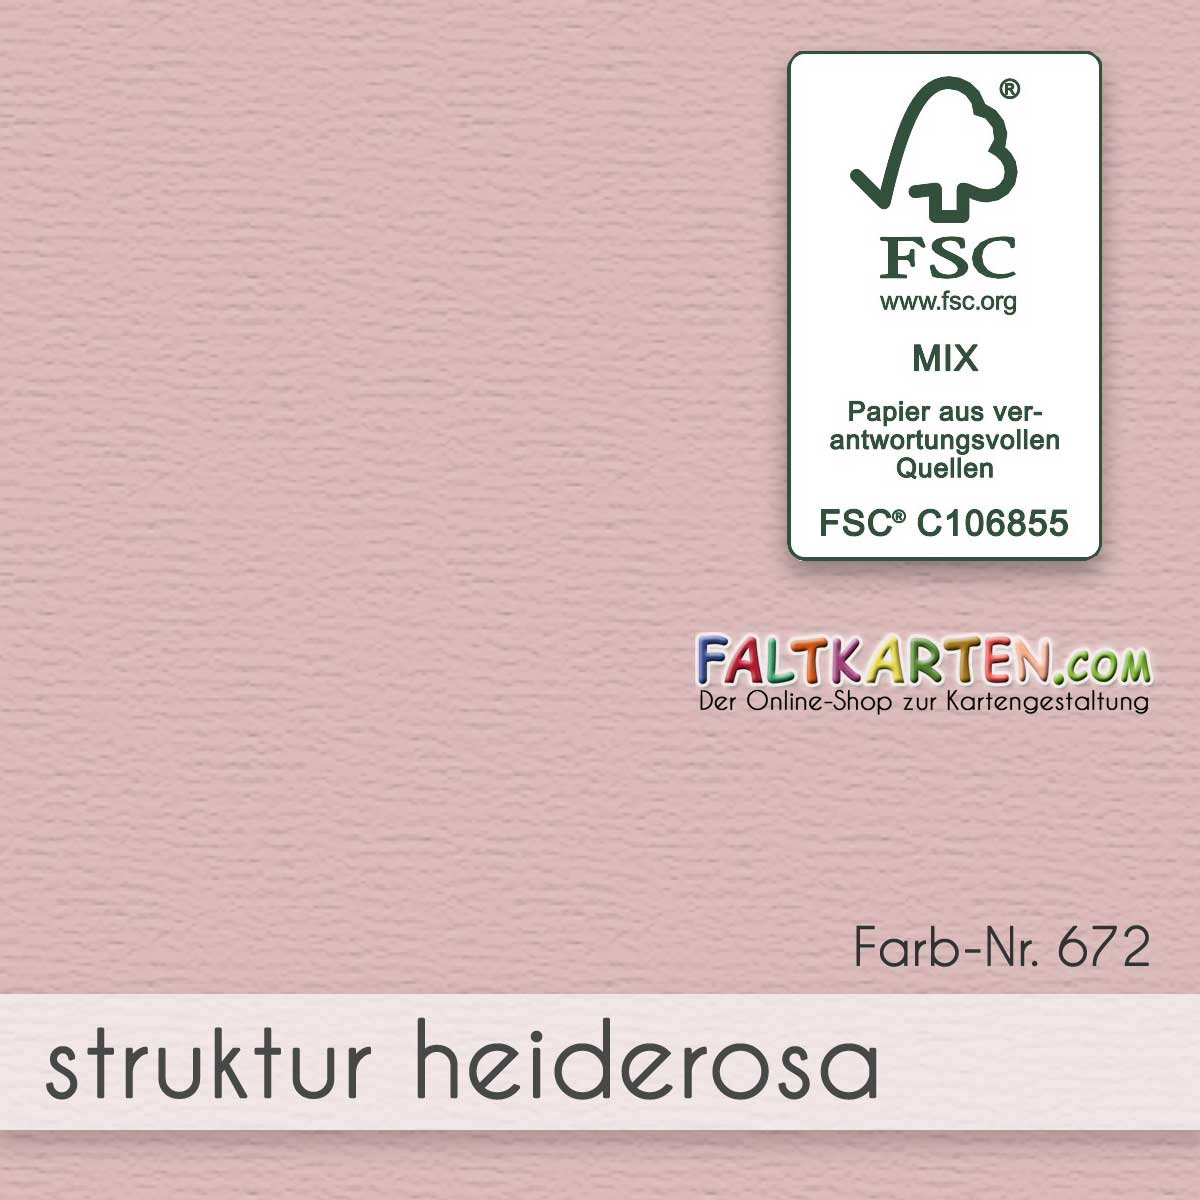 Farbton: struktur heiderosa